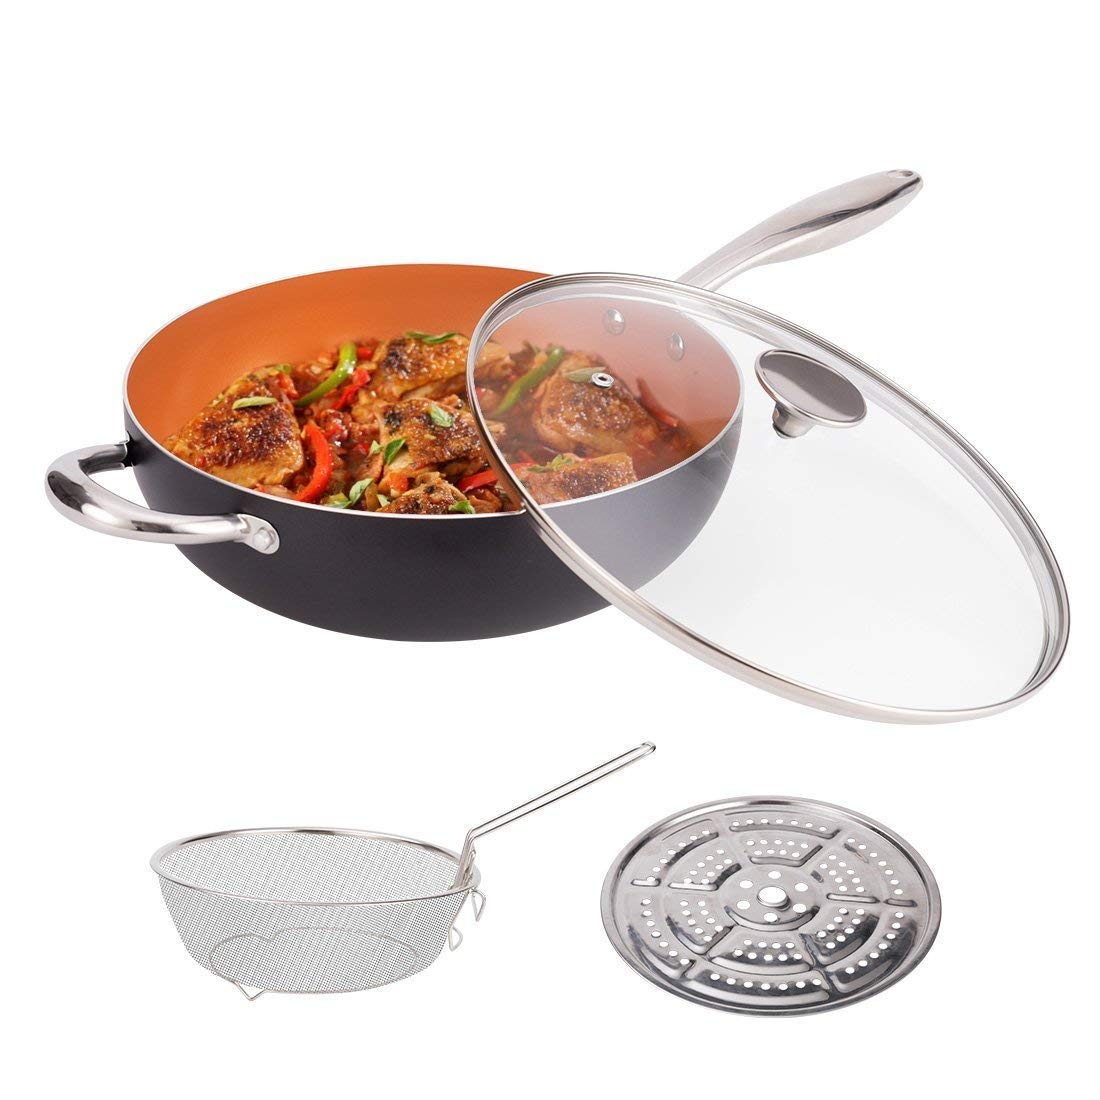 MICHELANGELO 5 Quart Nonstick Woks and Stir Fry Pans With Lid, Frying Basket Steam Rack, Nonstick Copper Wok Pan With Lid, Ceramic Wok With Lid, Nonstick Frying Wok, Induction Compatible (Renewed) by MICHELANGELO